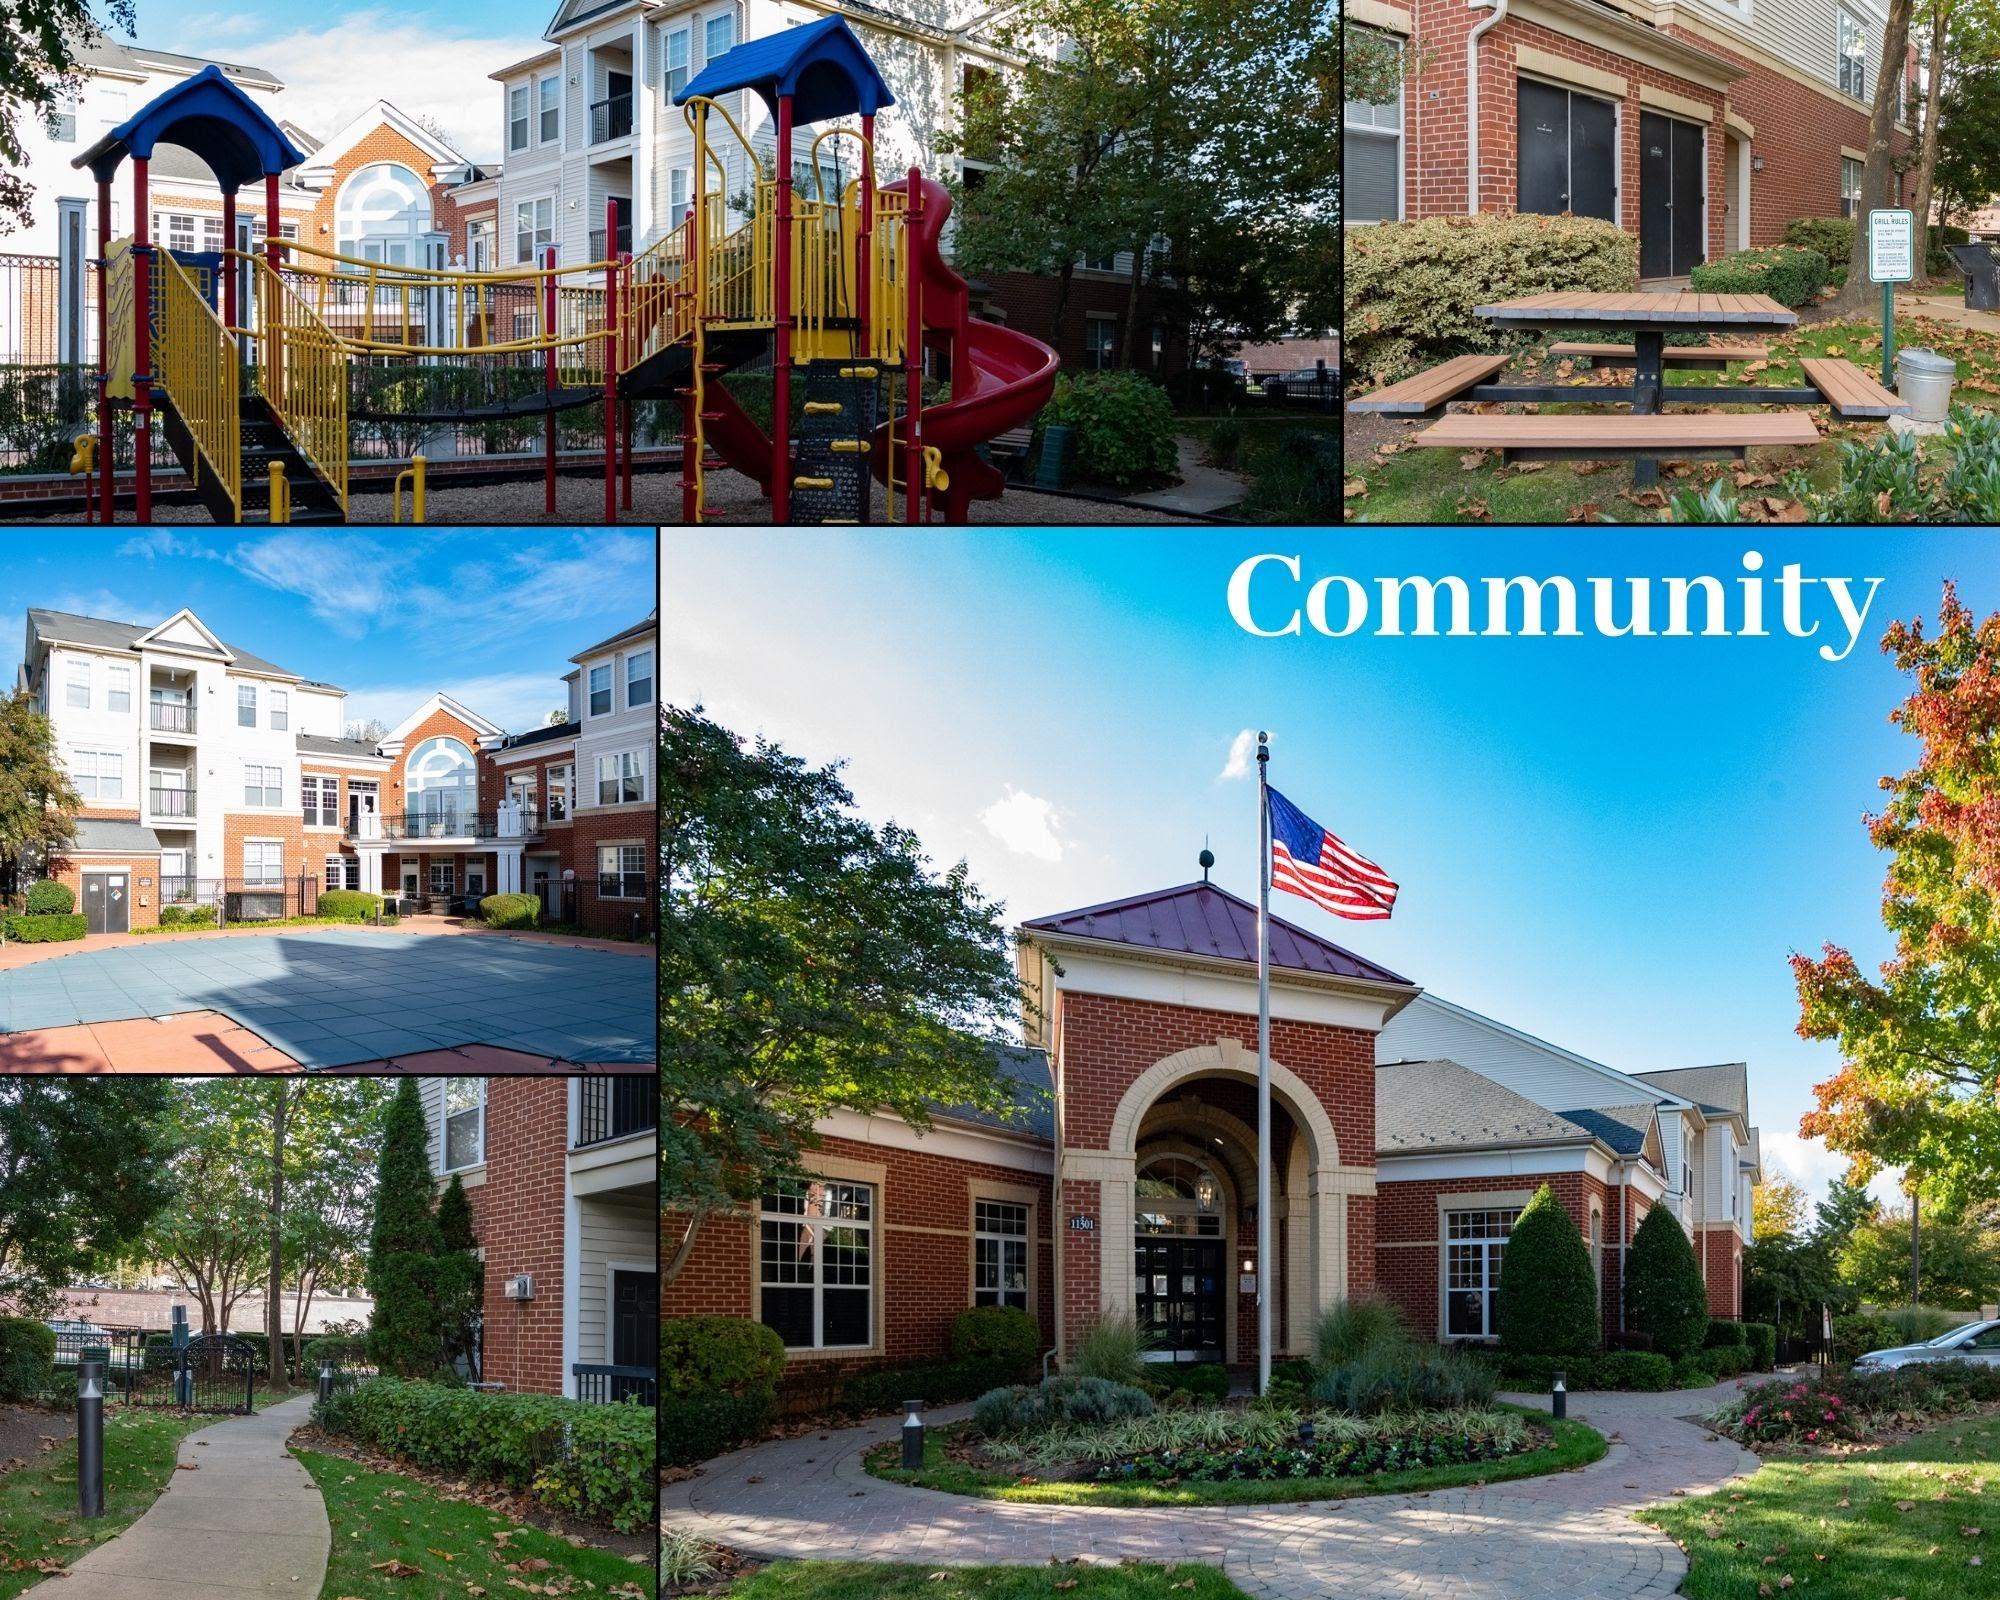 Fairfax Ridge Community